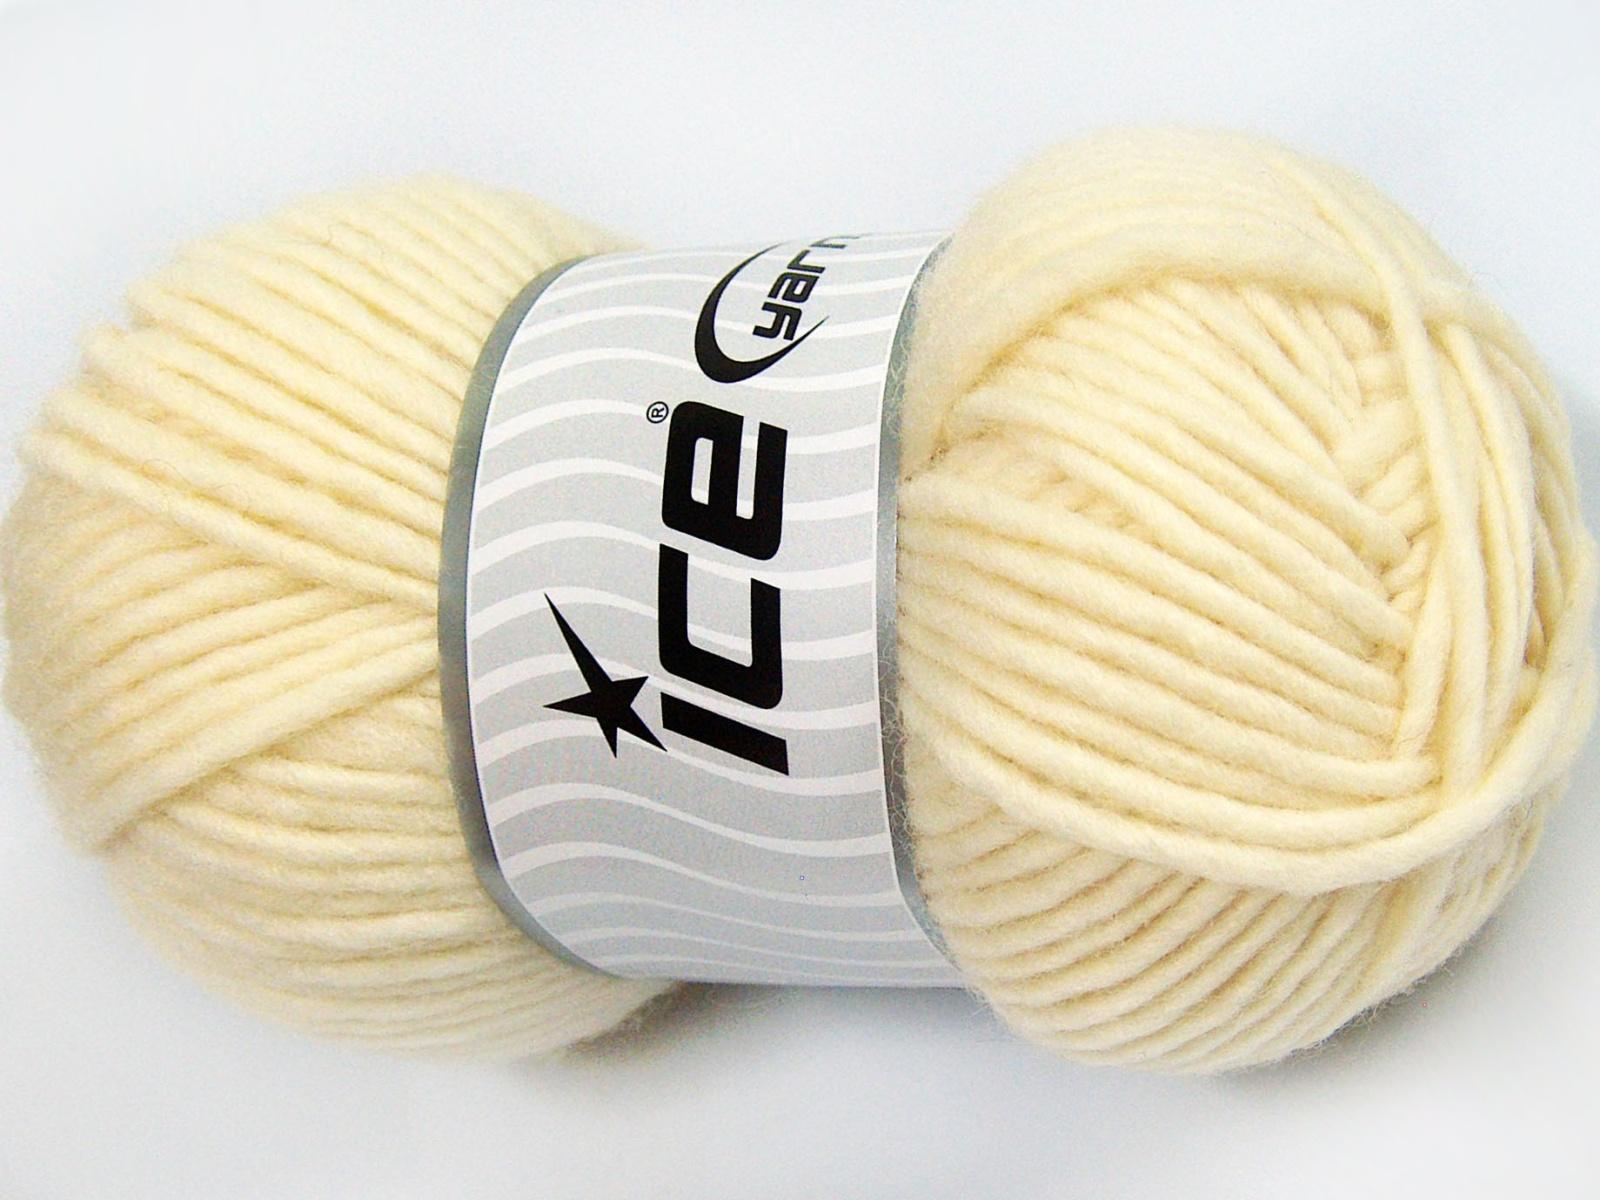 Cow Amigurumi - MooMoo Cow - Free Crochet Pattern #felting (With ... | 1200x1600